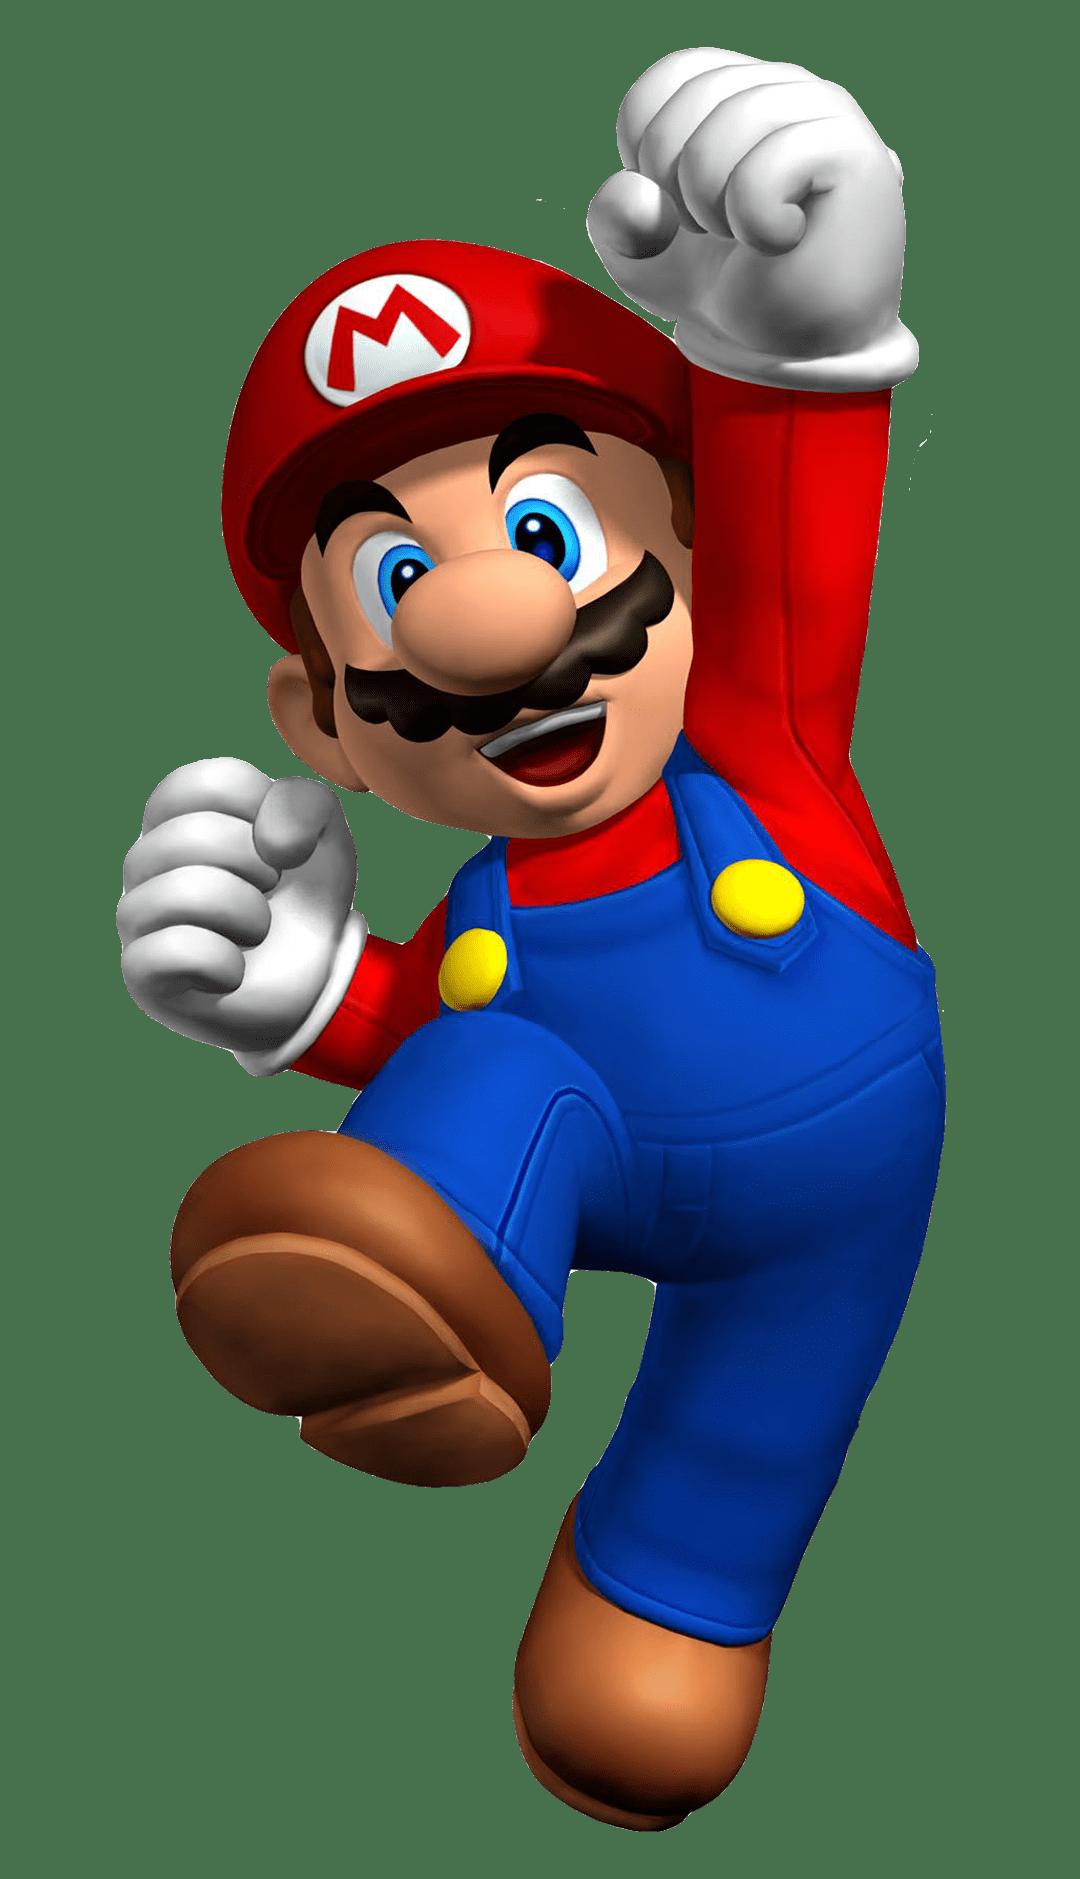 Mario jumping transparent png stickpng - Dibujos de super mario bros ...